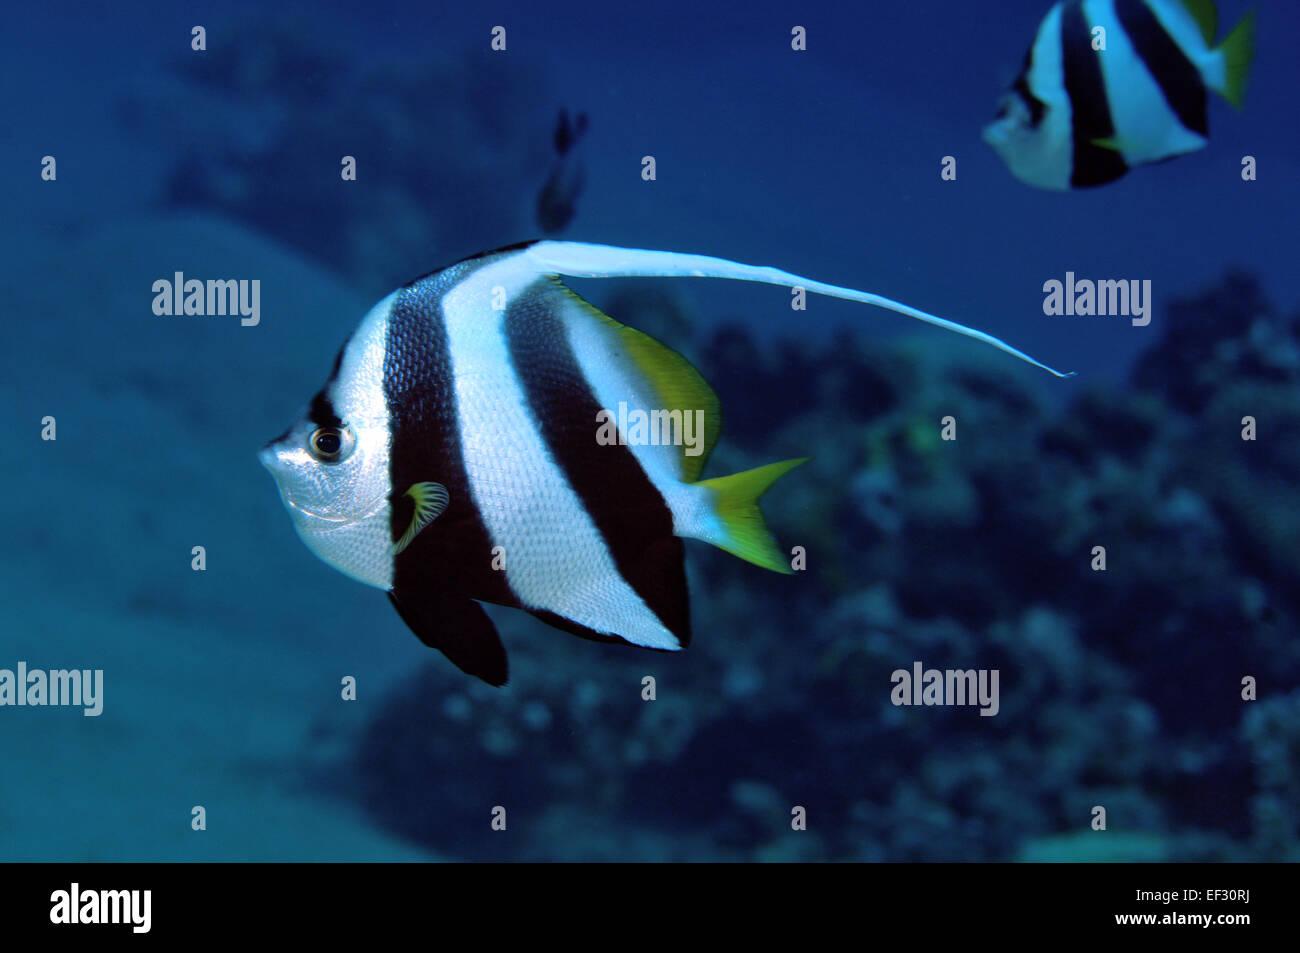 Pennant bannerfish or coralfish, Heniochus acuminatus, Eilat, Red Sea,  Israel - Stock Image